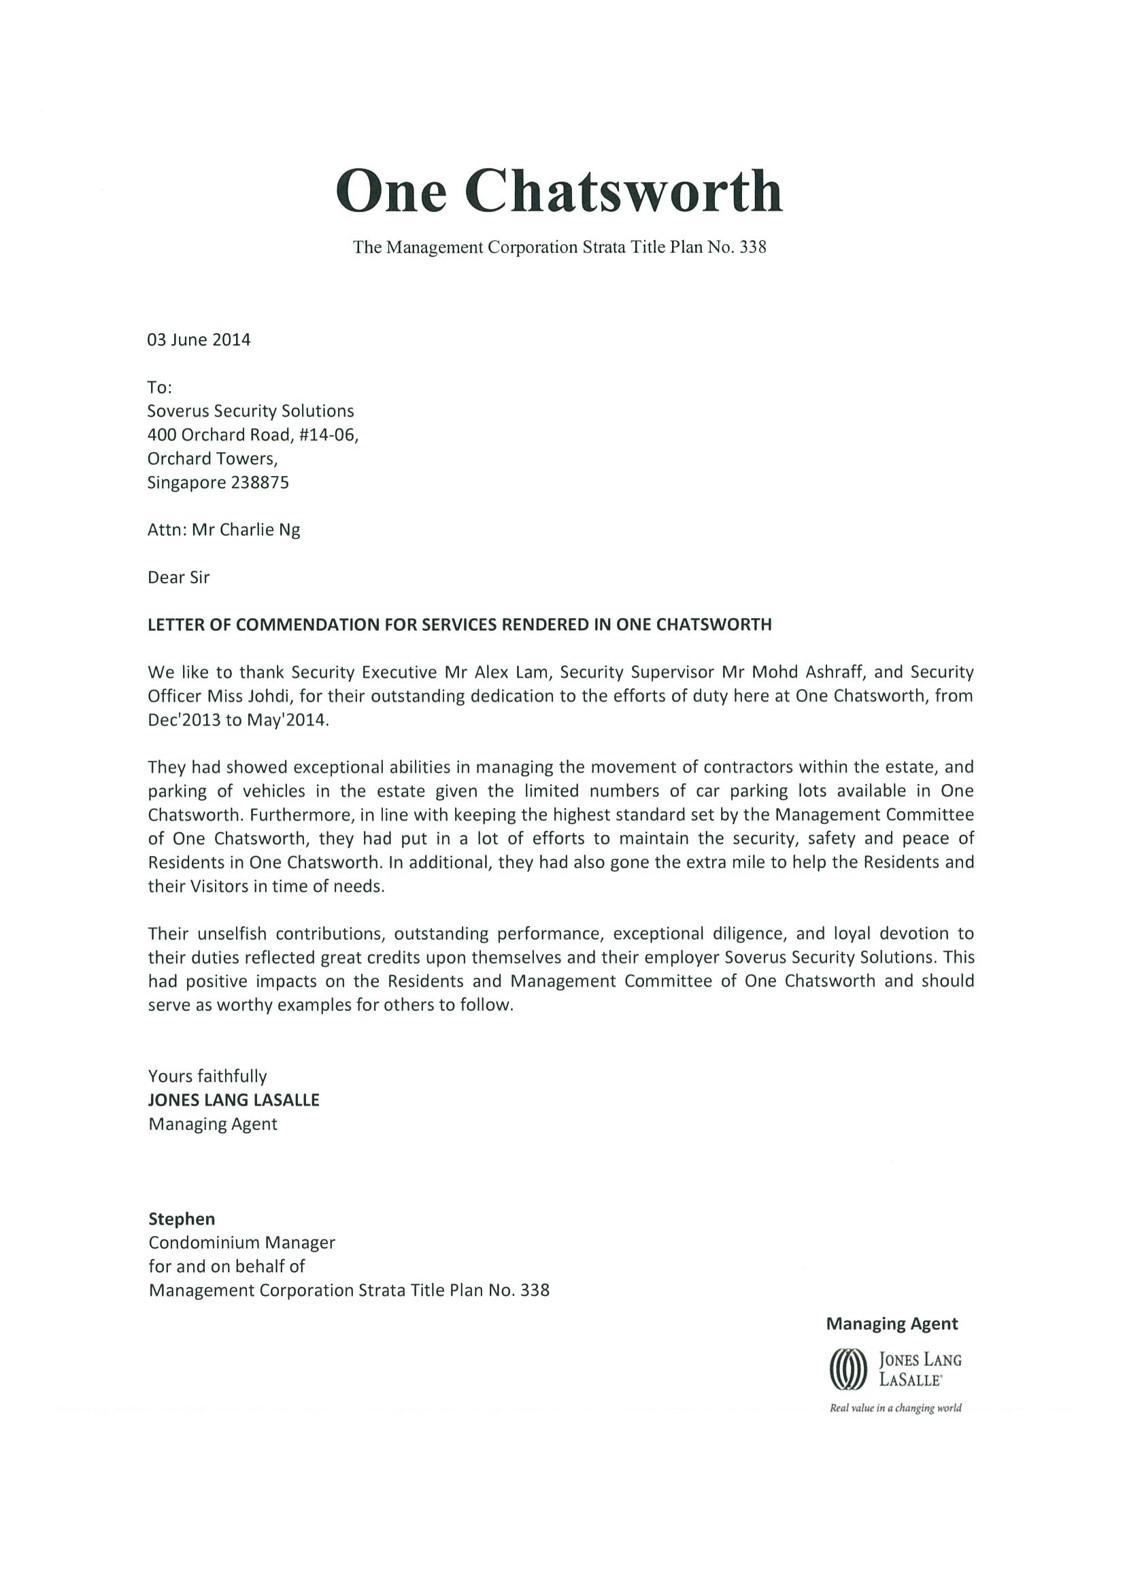 03 Jun 14 2014 Letter of mendation e Chatsworth Soverus